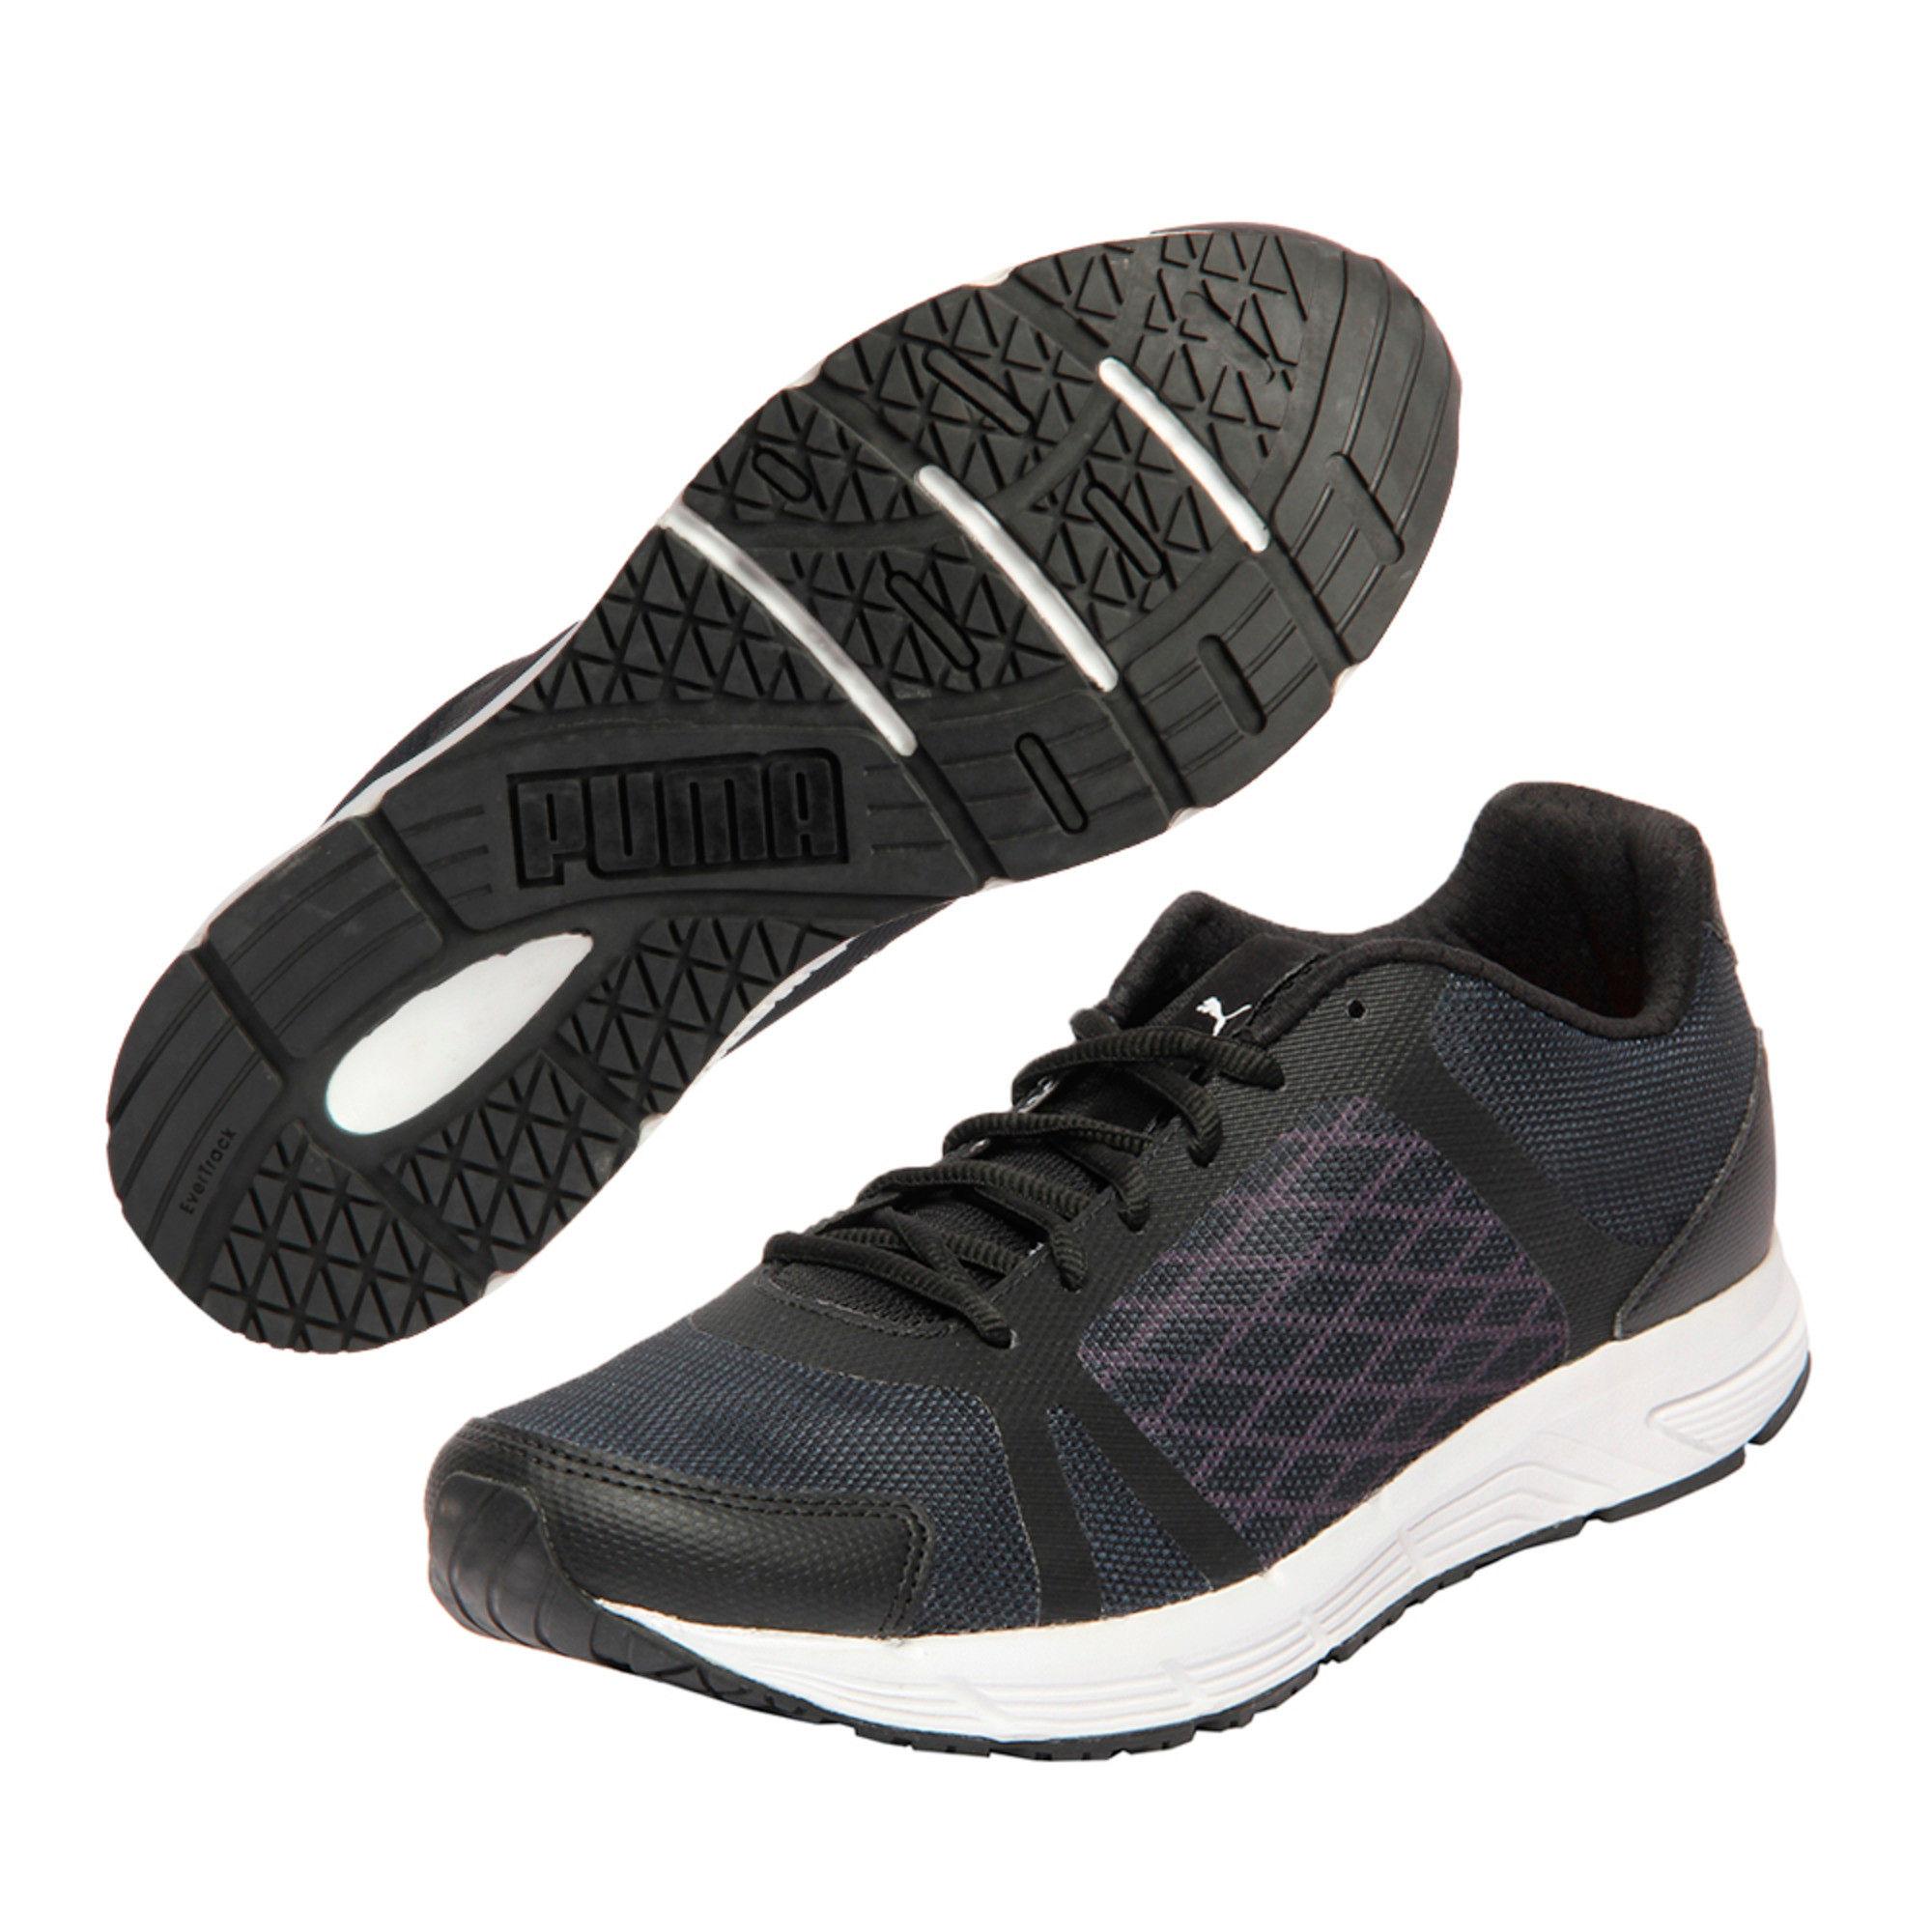 Puma Sigma IDP Unisex Black Sneakers